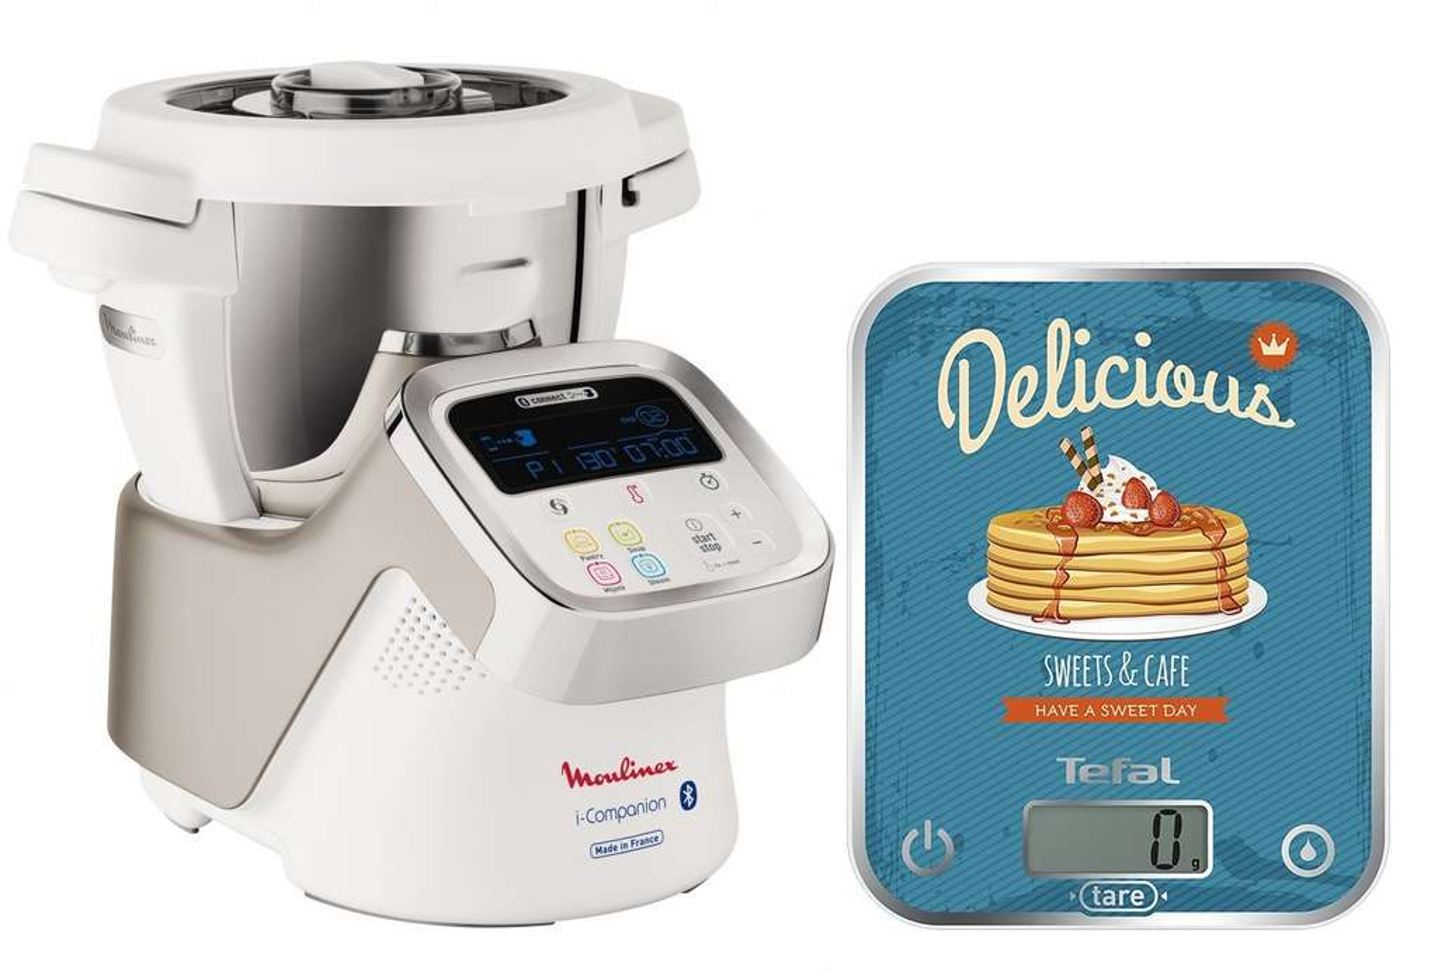 Robot de cuisine moulinex i companion hf9001 balance - Balance de cuisine moulinex ...